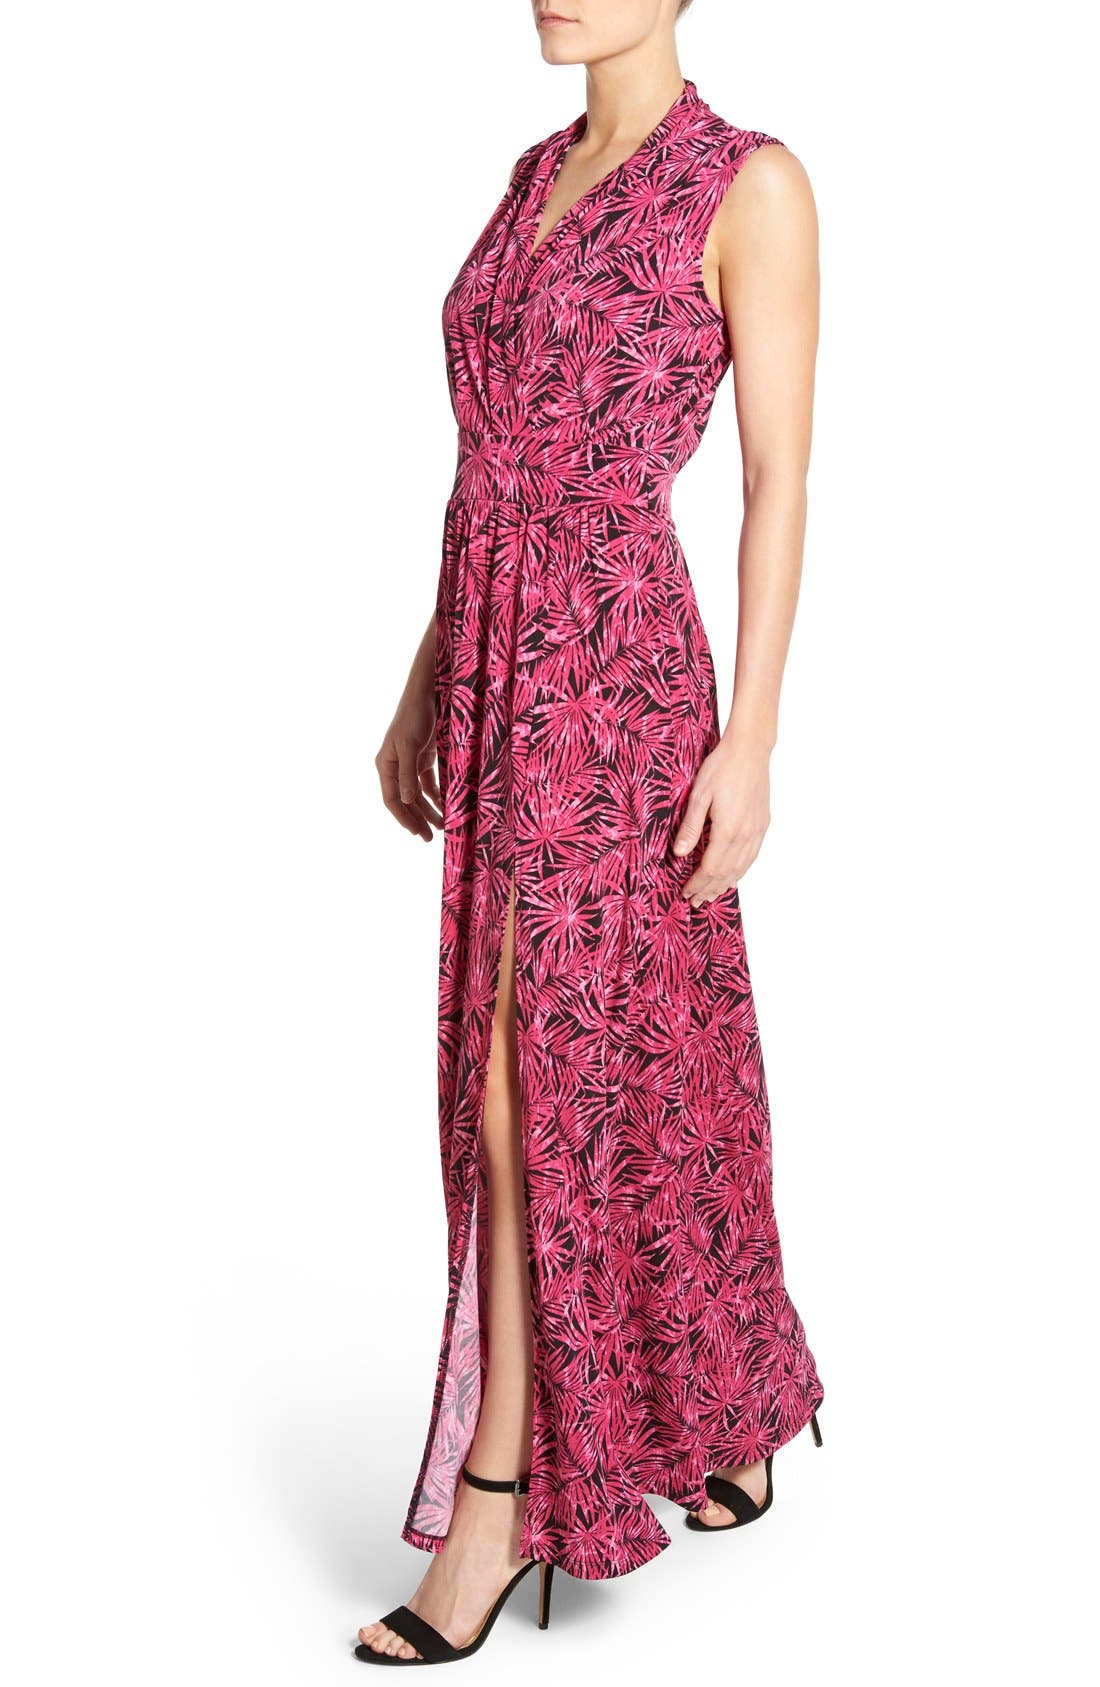 MICHAEL MICHAEL KORS, Print Jersey Side Slit Maxi Dress, Alternate thumbnail 2, color, 660